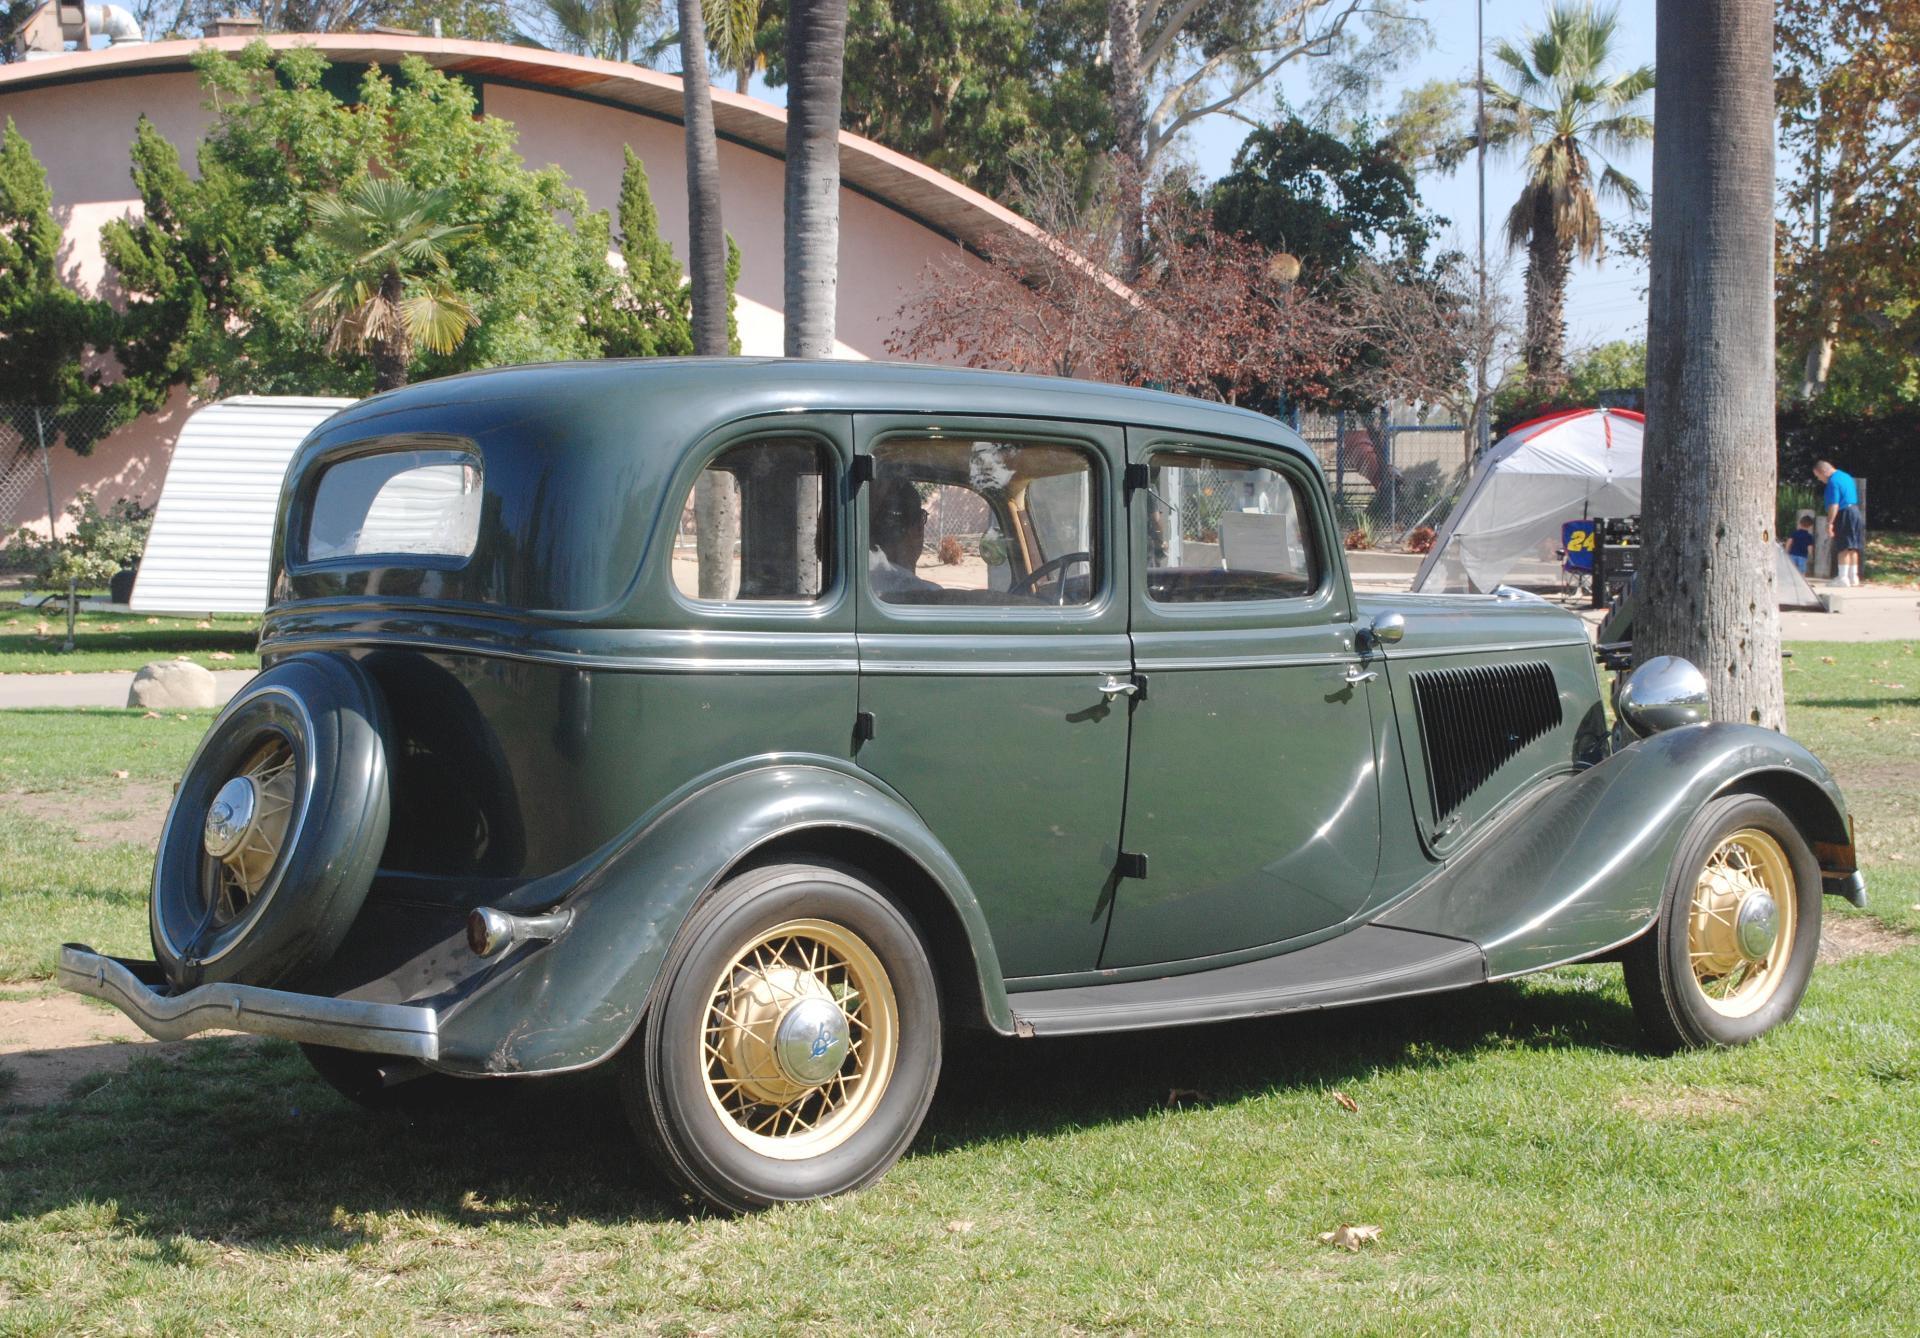 Ford 1934 4dr sedan rr rt 3_4.JPG